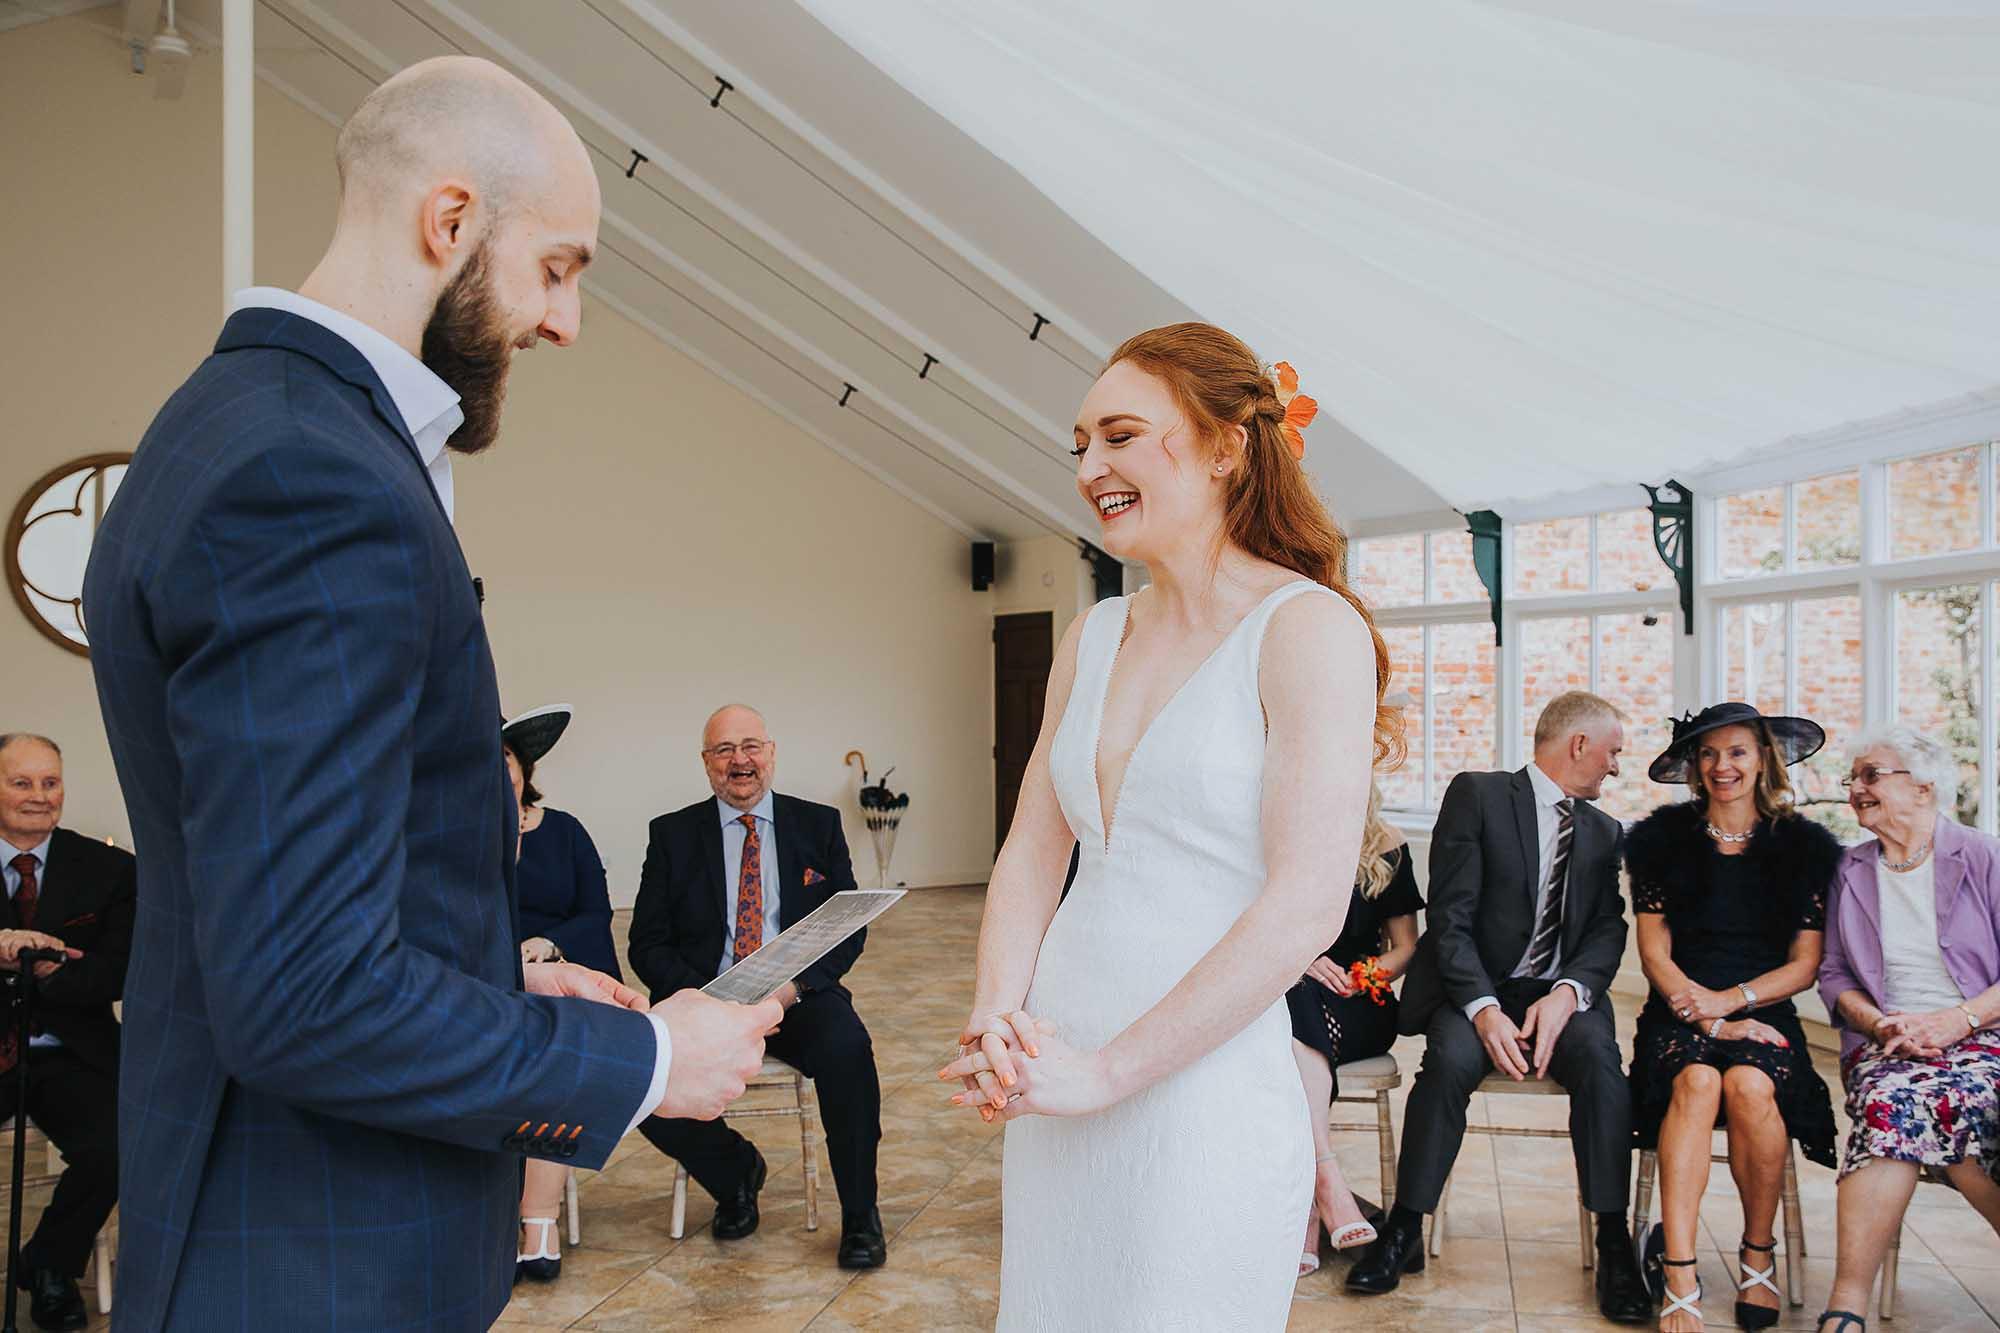 Combermere Abbey civil ceremony